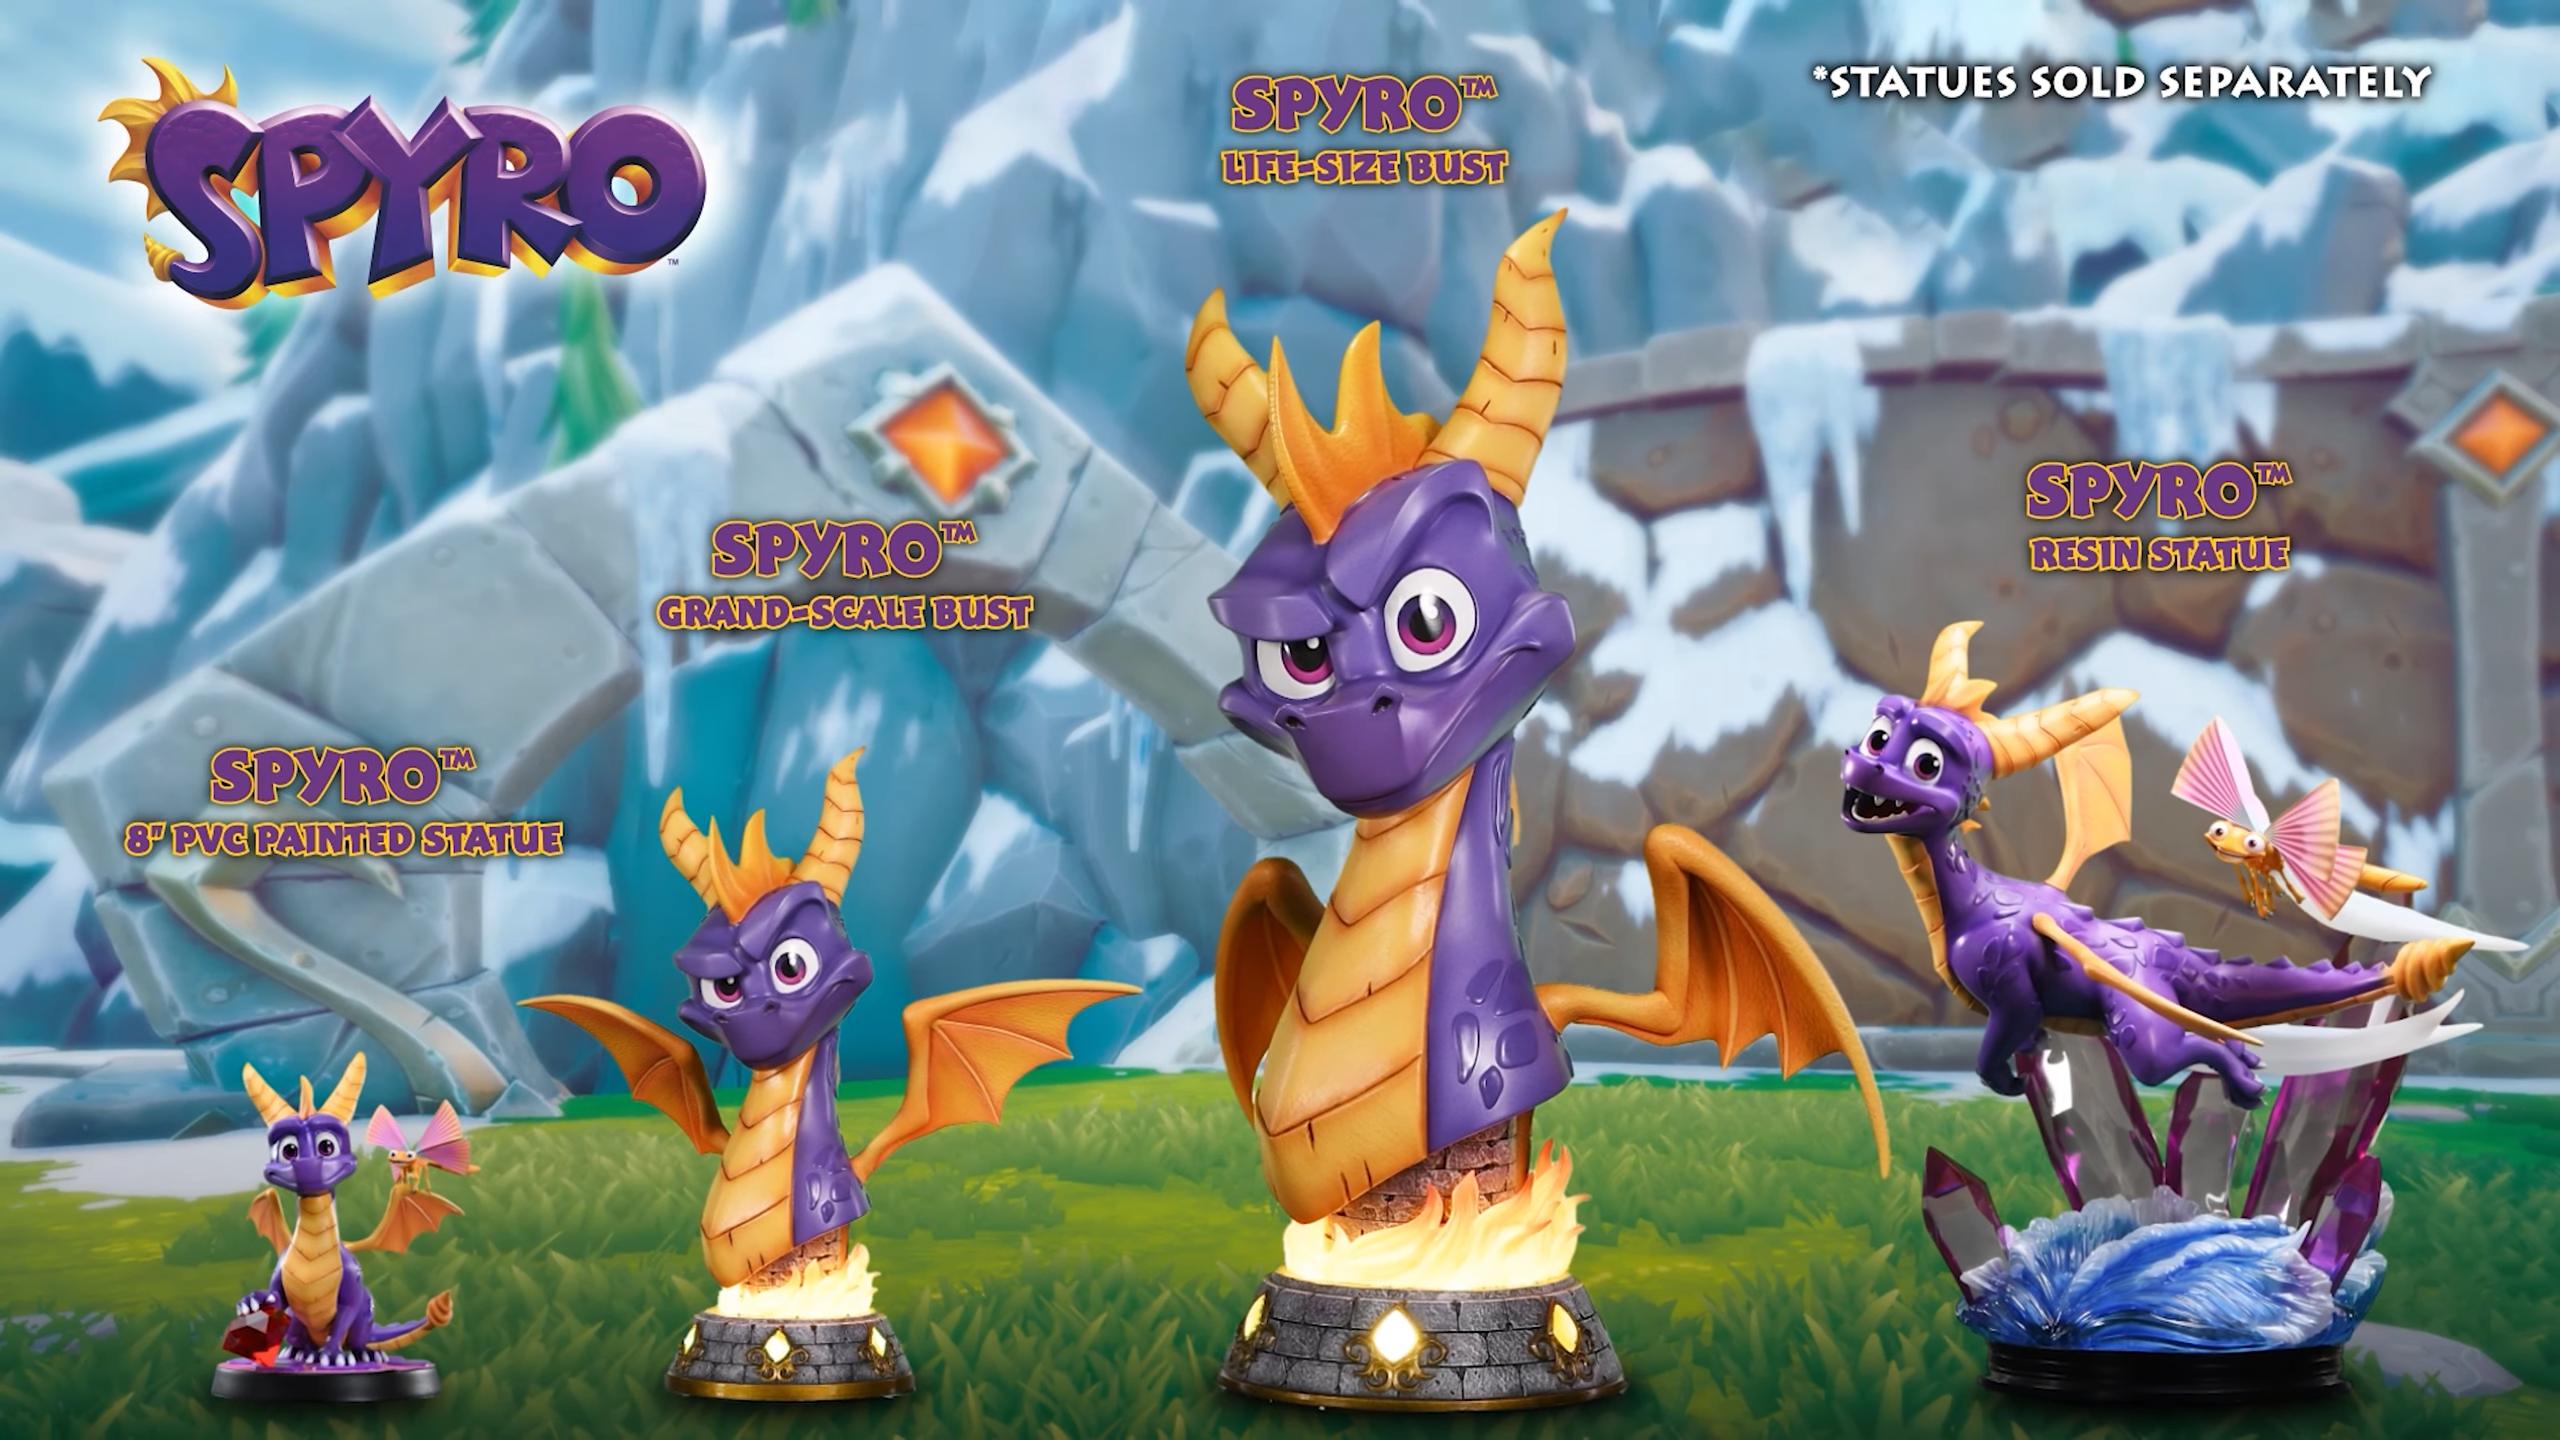 First 4 Figures Spyro™ the Dragon series